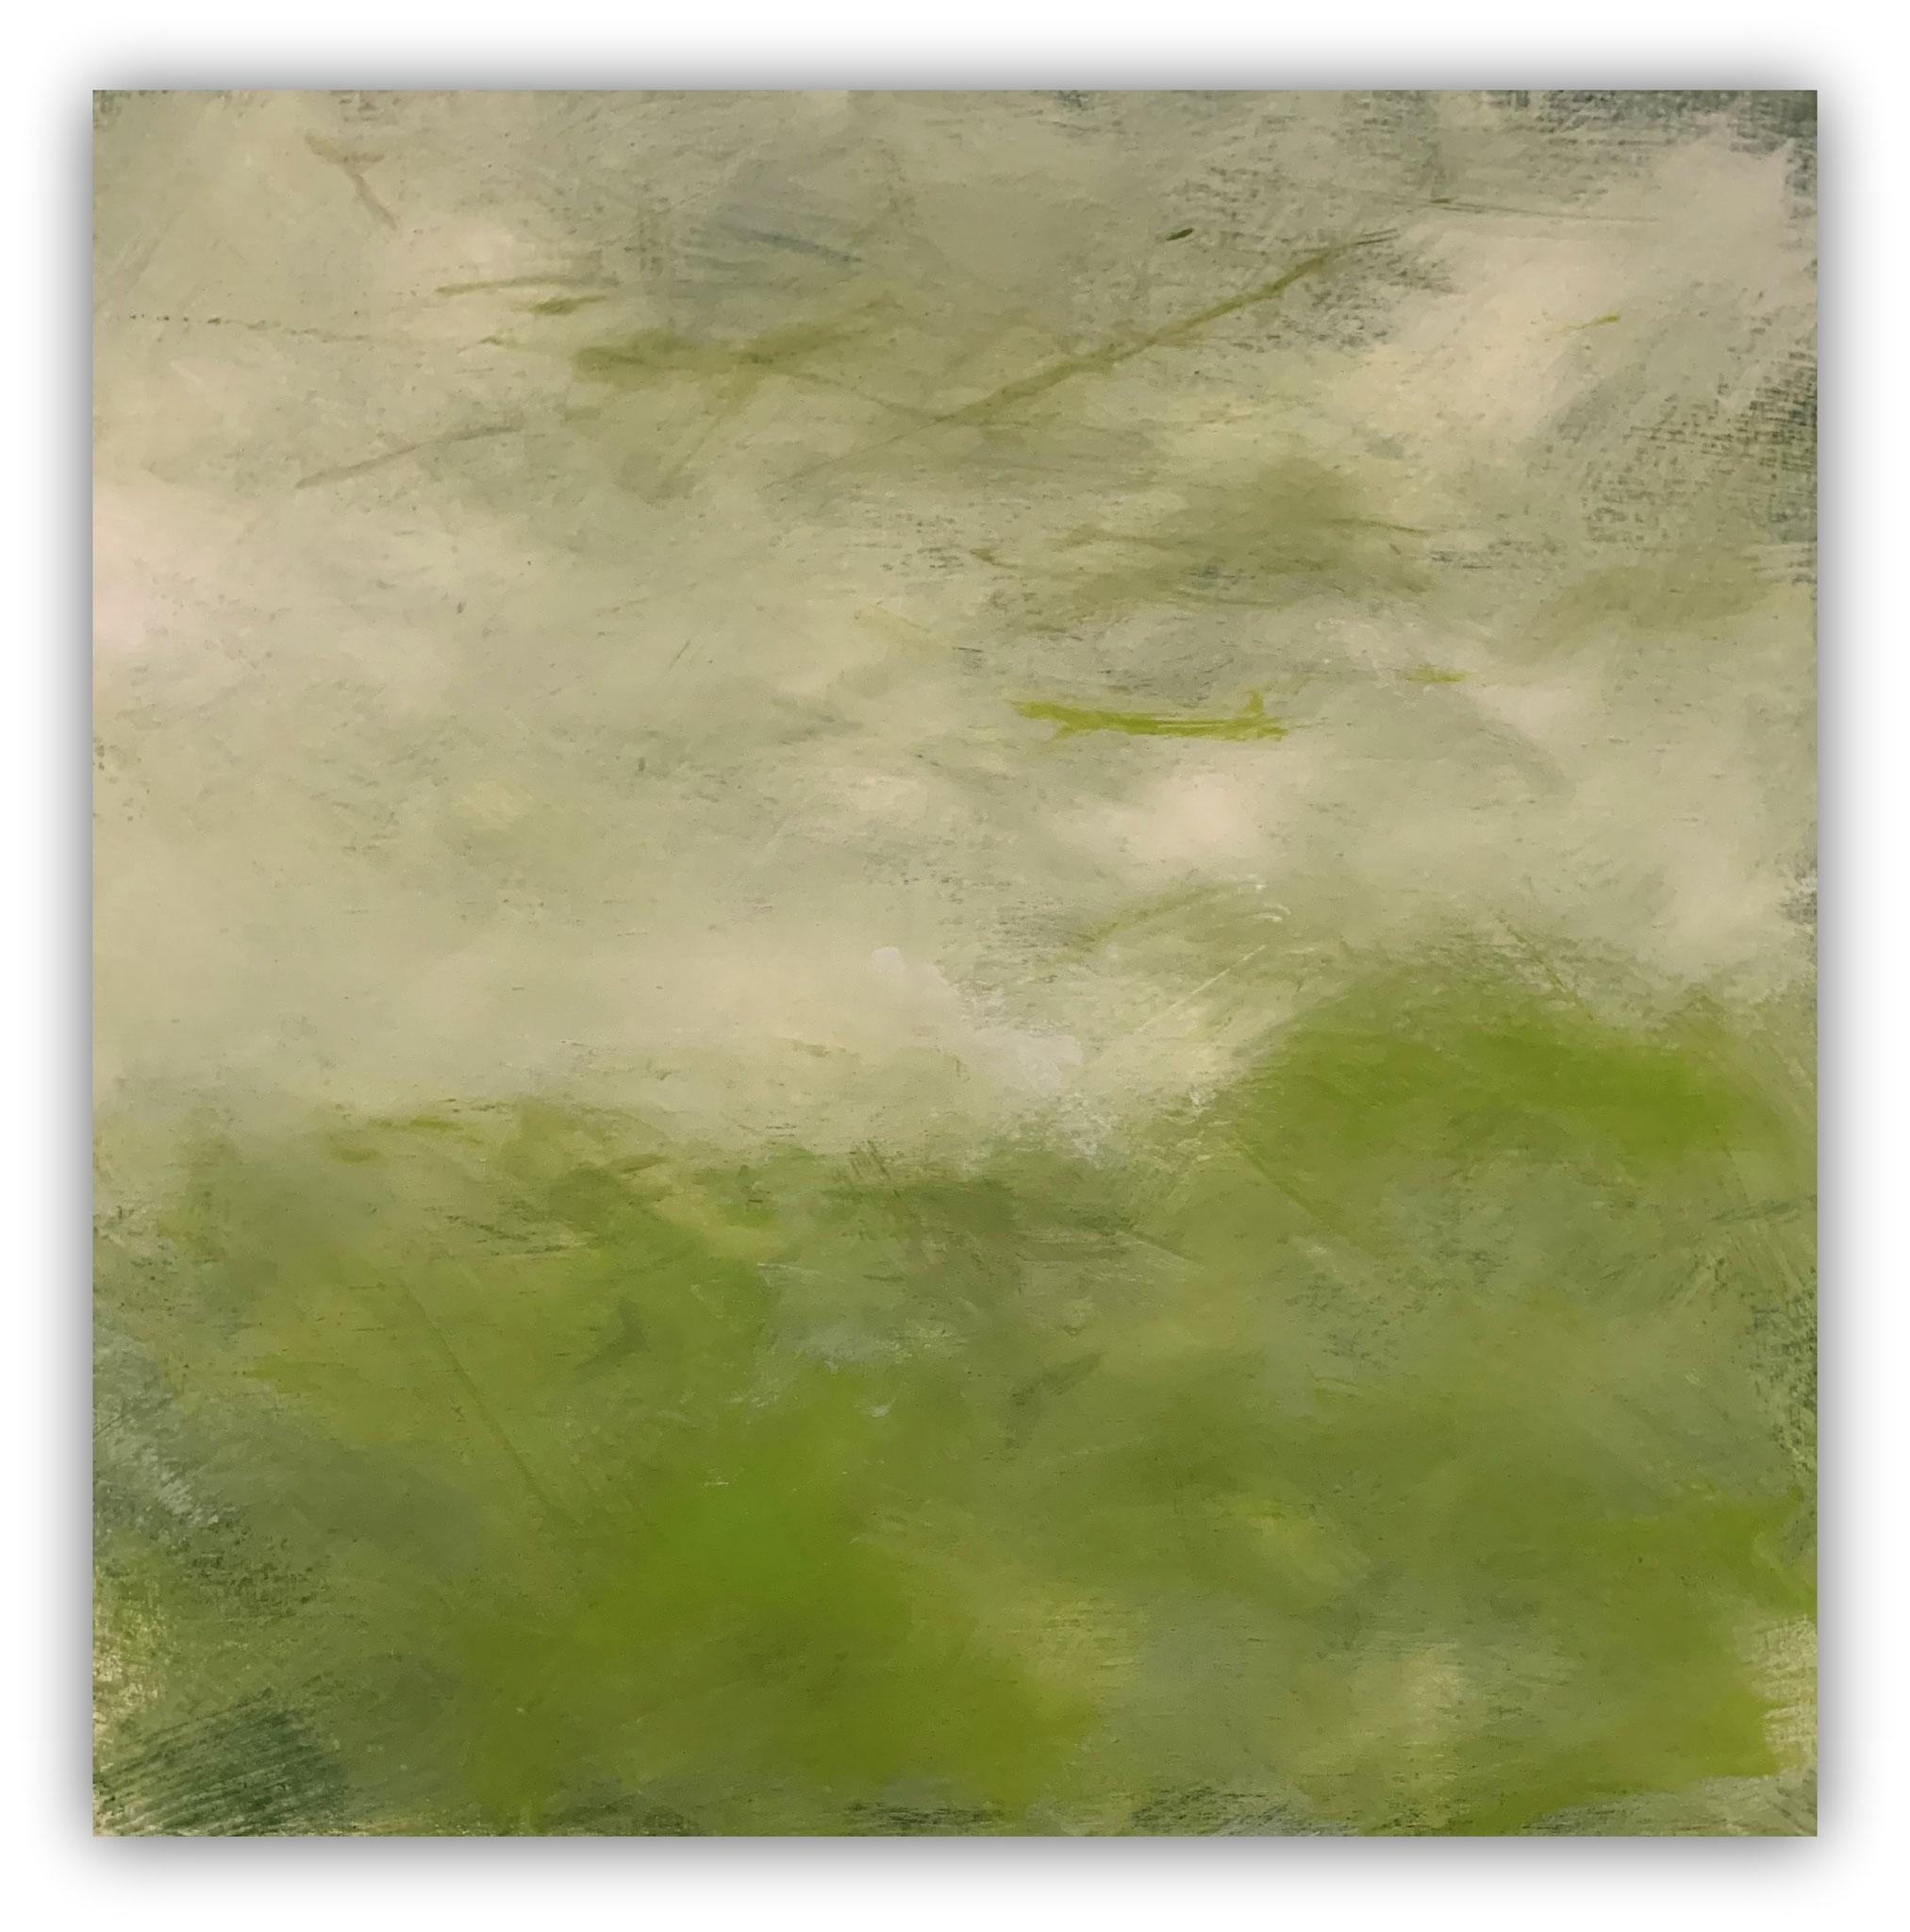 Ybbsufer 90 x 90 cm/Dispersion, Acryl auf Leinen